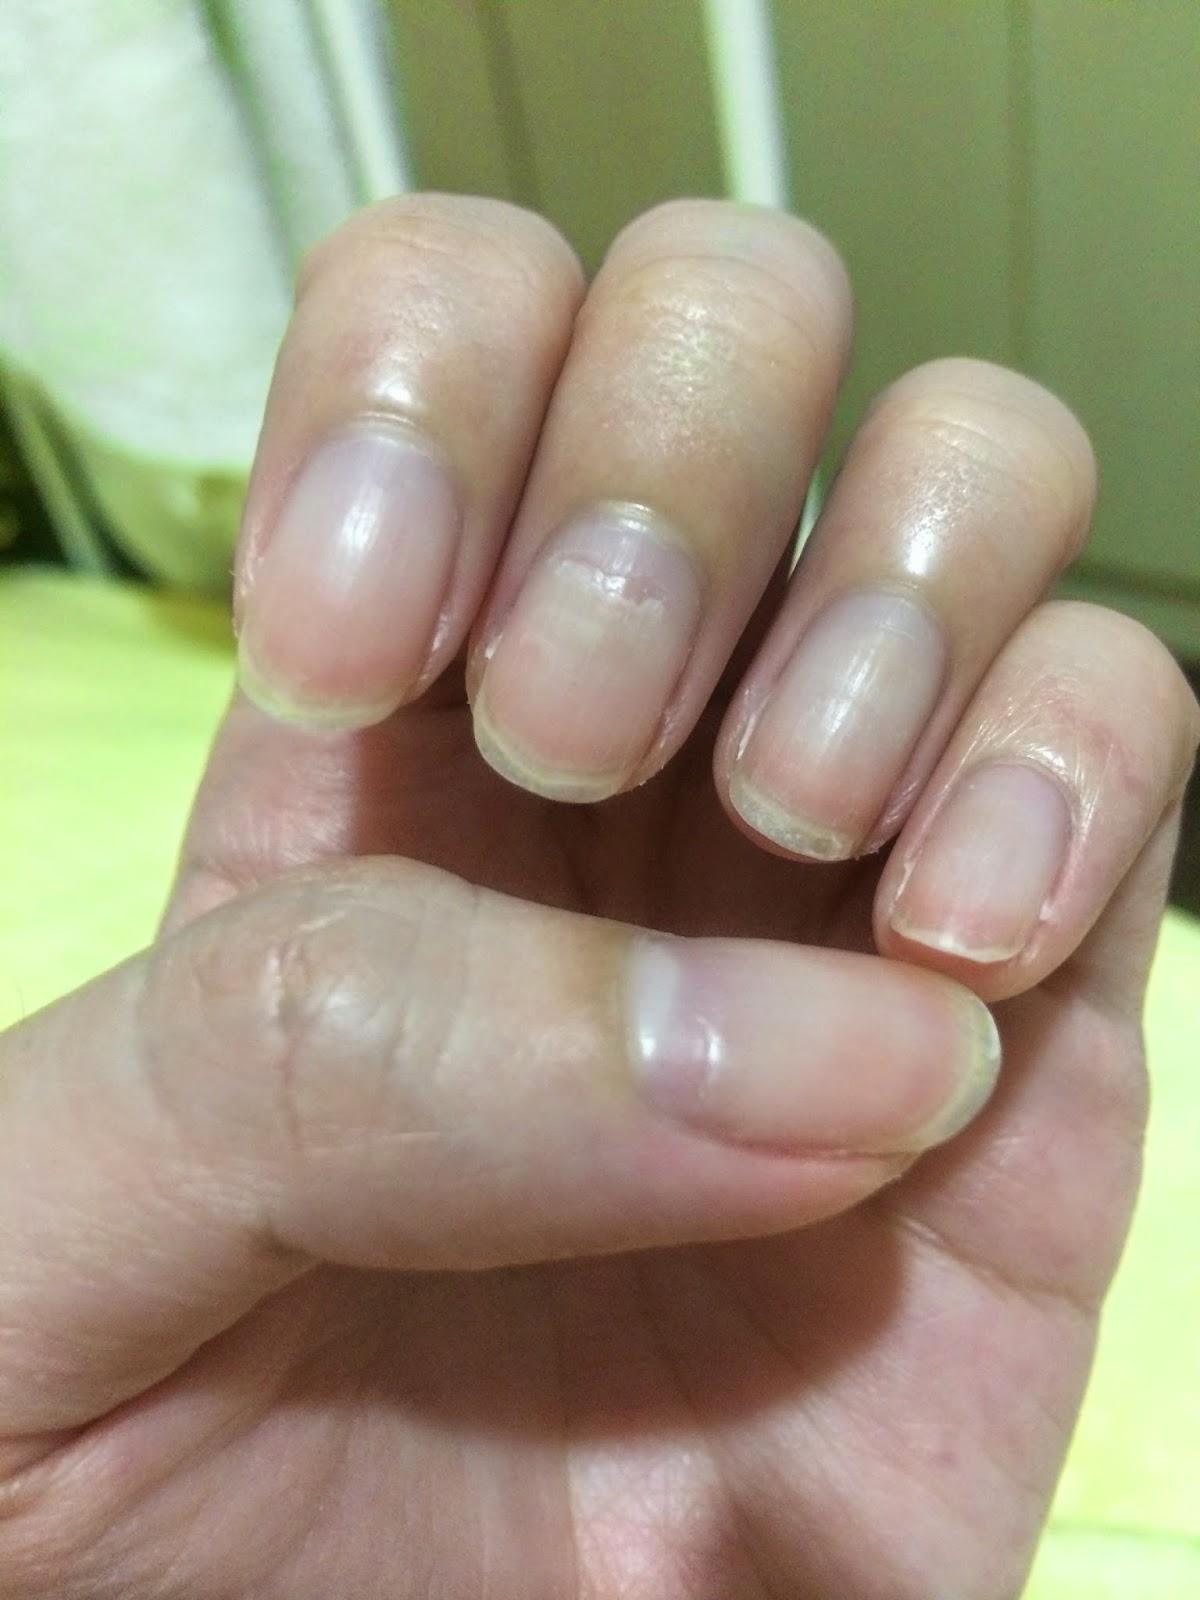 The Dettol Diaries Peeling Fingernails After Hfmd